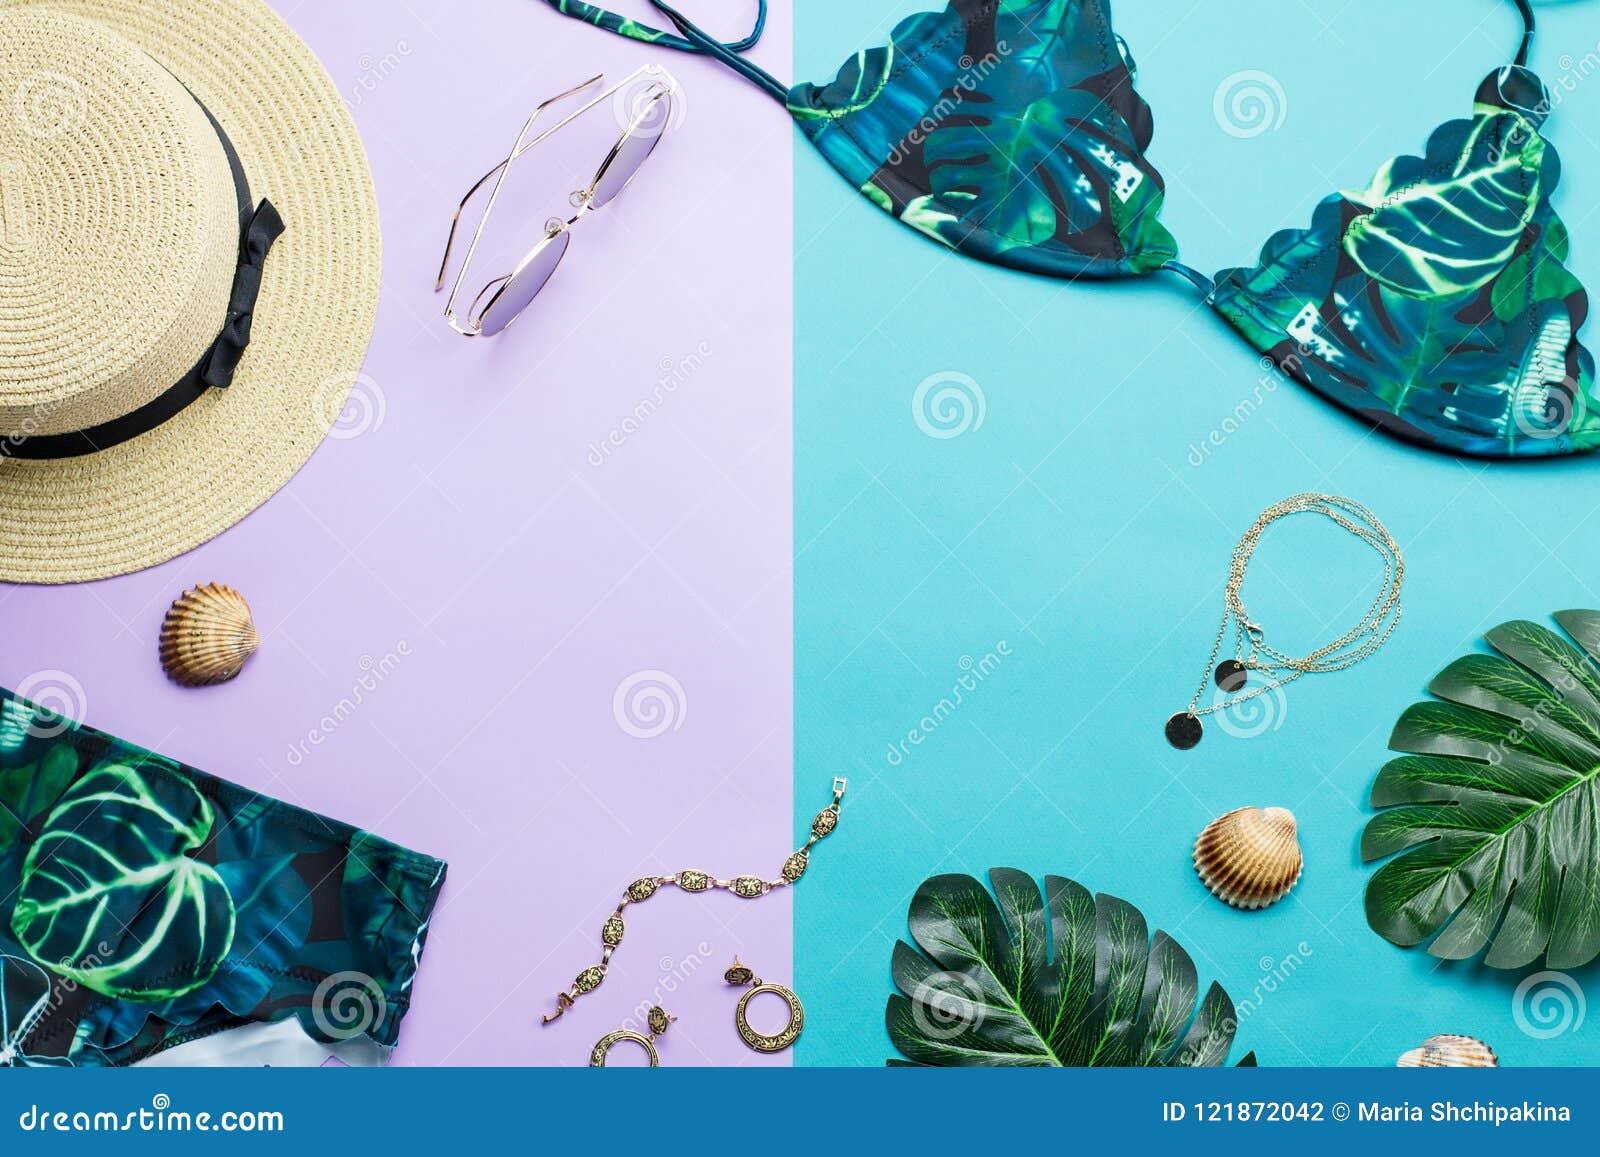 edd842fd Tropical bikini swimsuit, beach fashion. Traveler woman accessories flat lay  with swimwear, palm leaves.